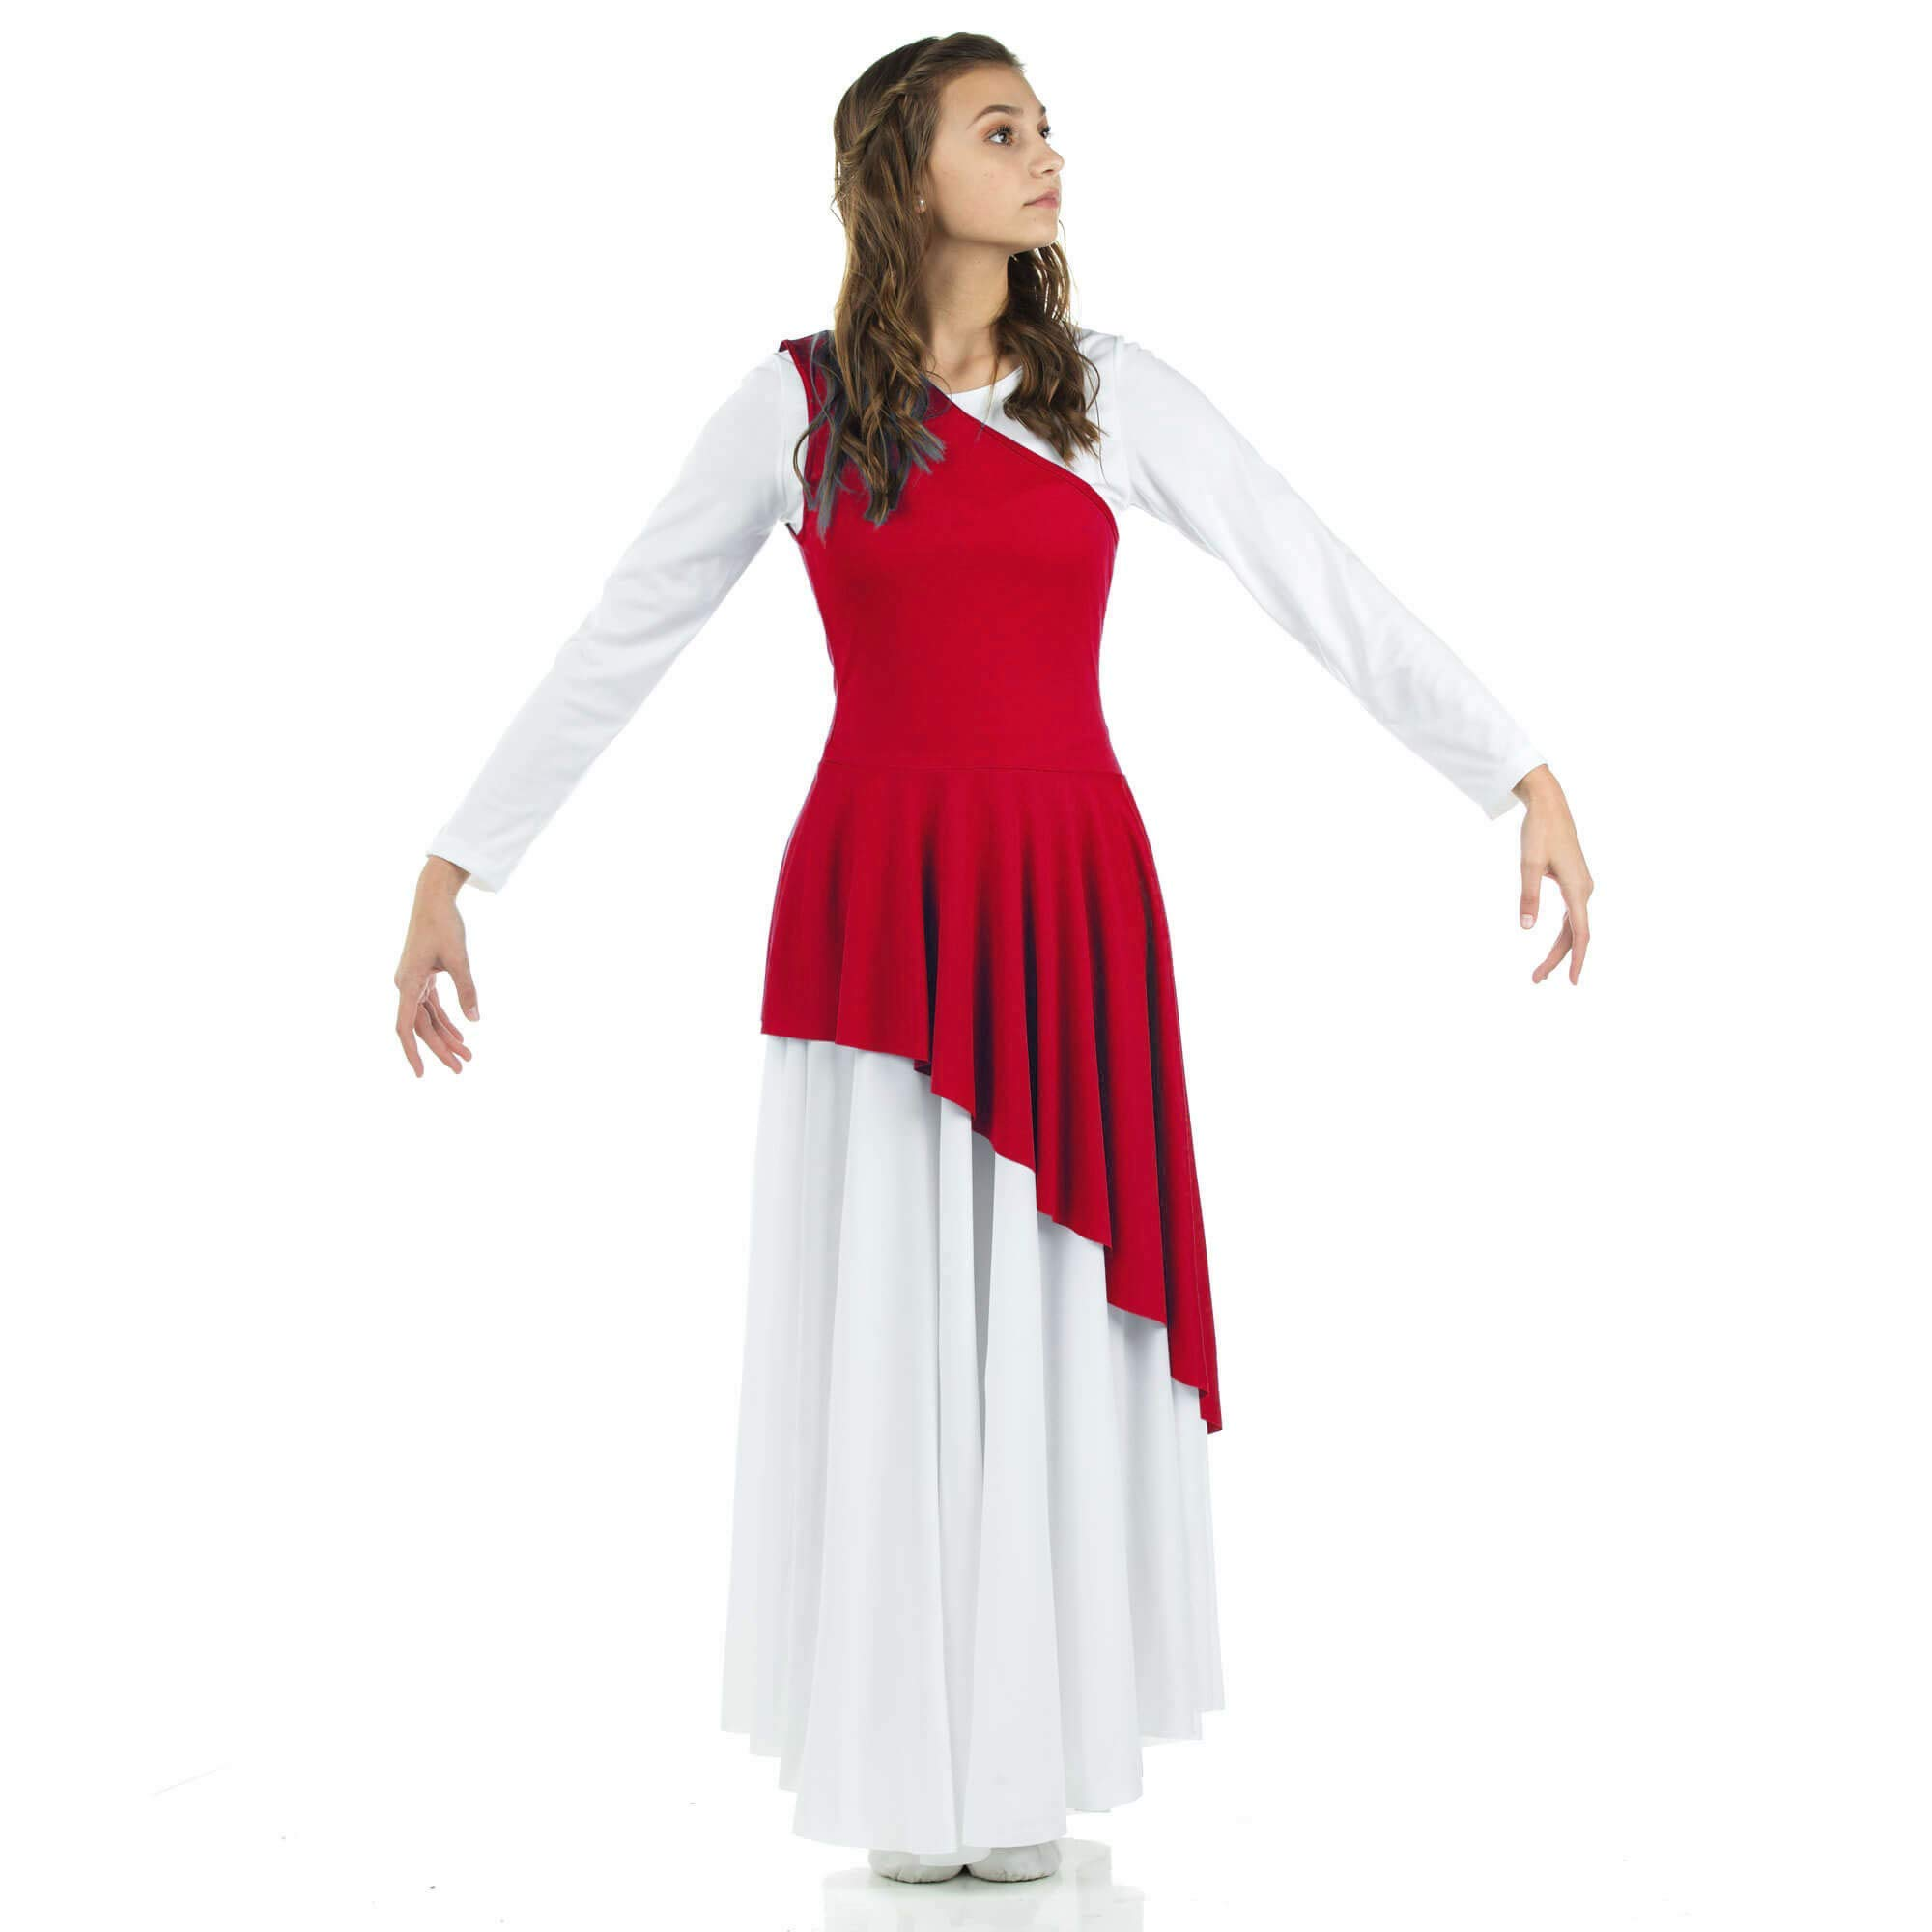 Danzcue Girl's Asymmetrical Praise Dance Tunic (Scarlet, S-M-Child) by Danzcue